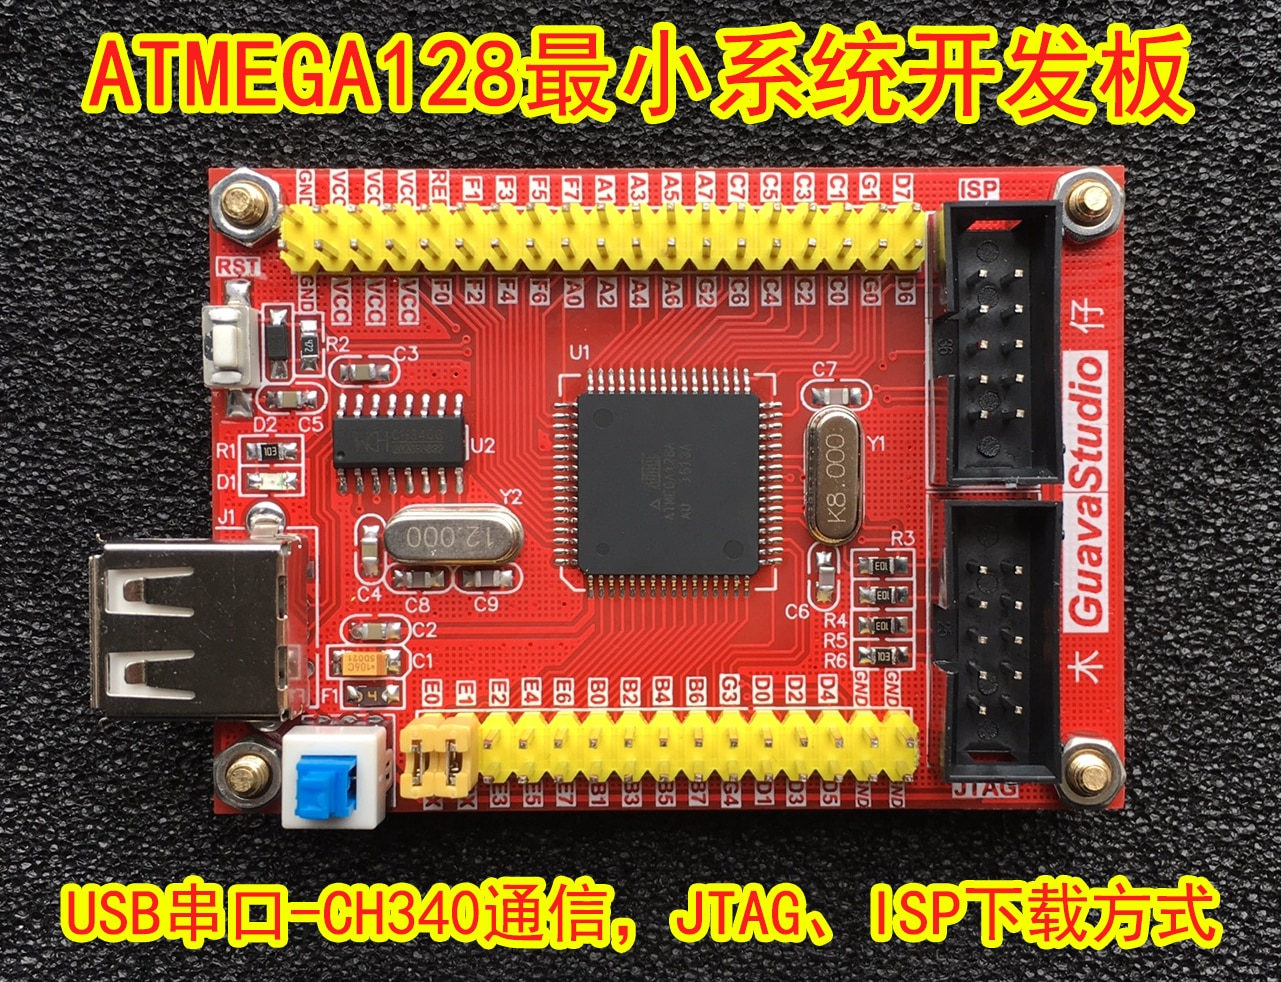 Atmega128 Placa de desarrollo Atmega128 sistema mínimo Atmega128A Placa de desarrollo de sistema mínimo